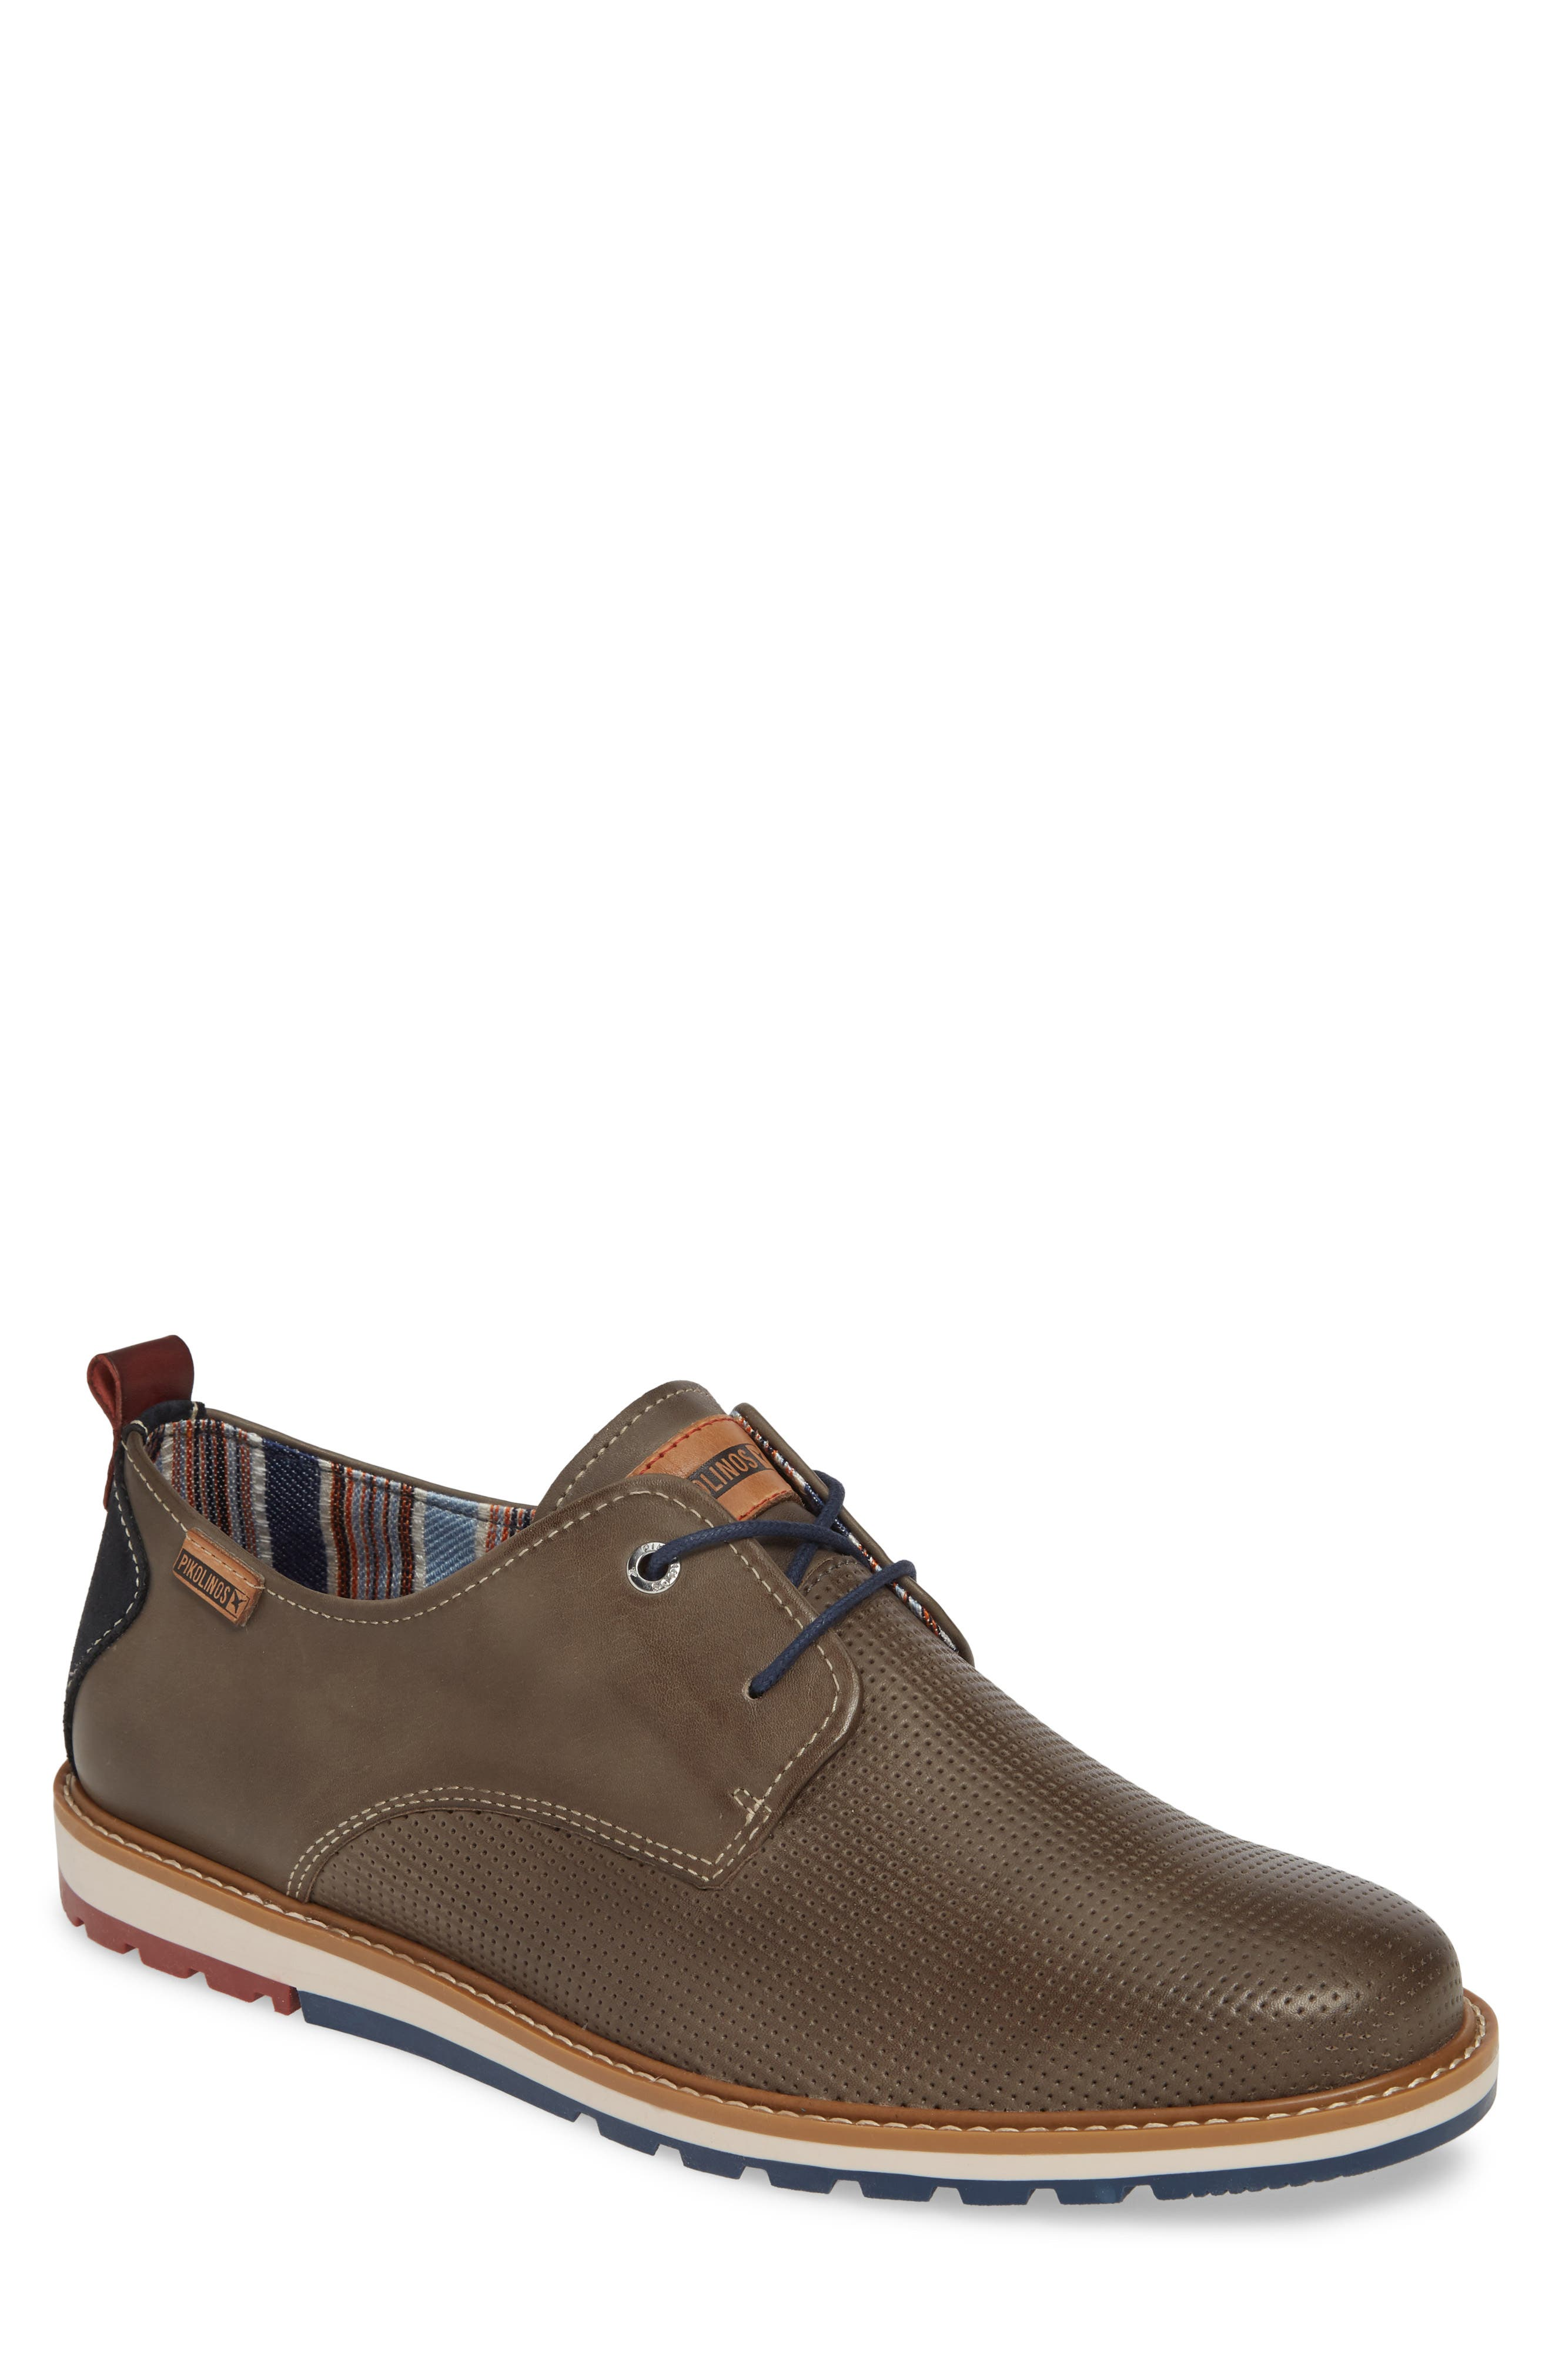 b898f47c453 Men s PIKOLINOS Shoes